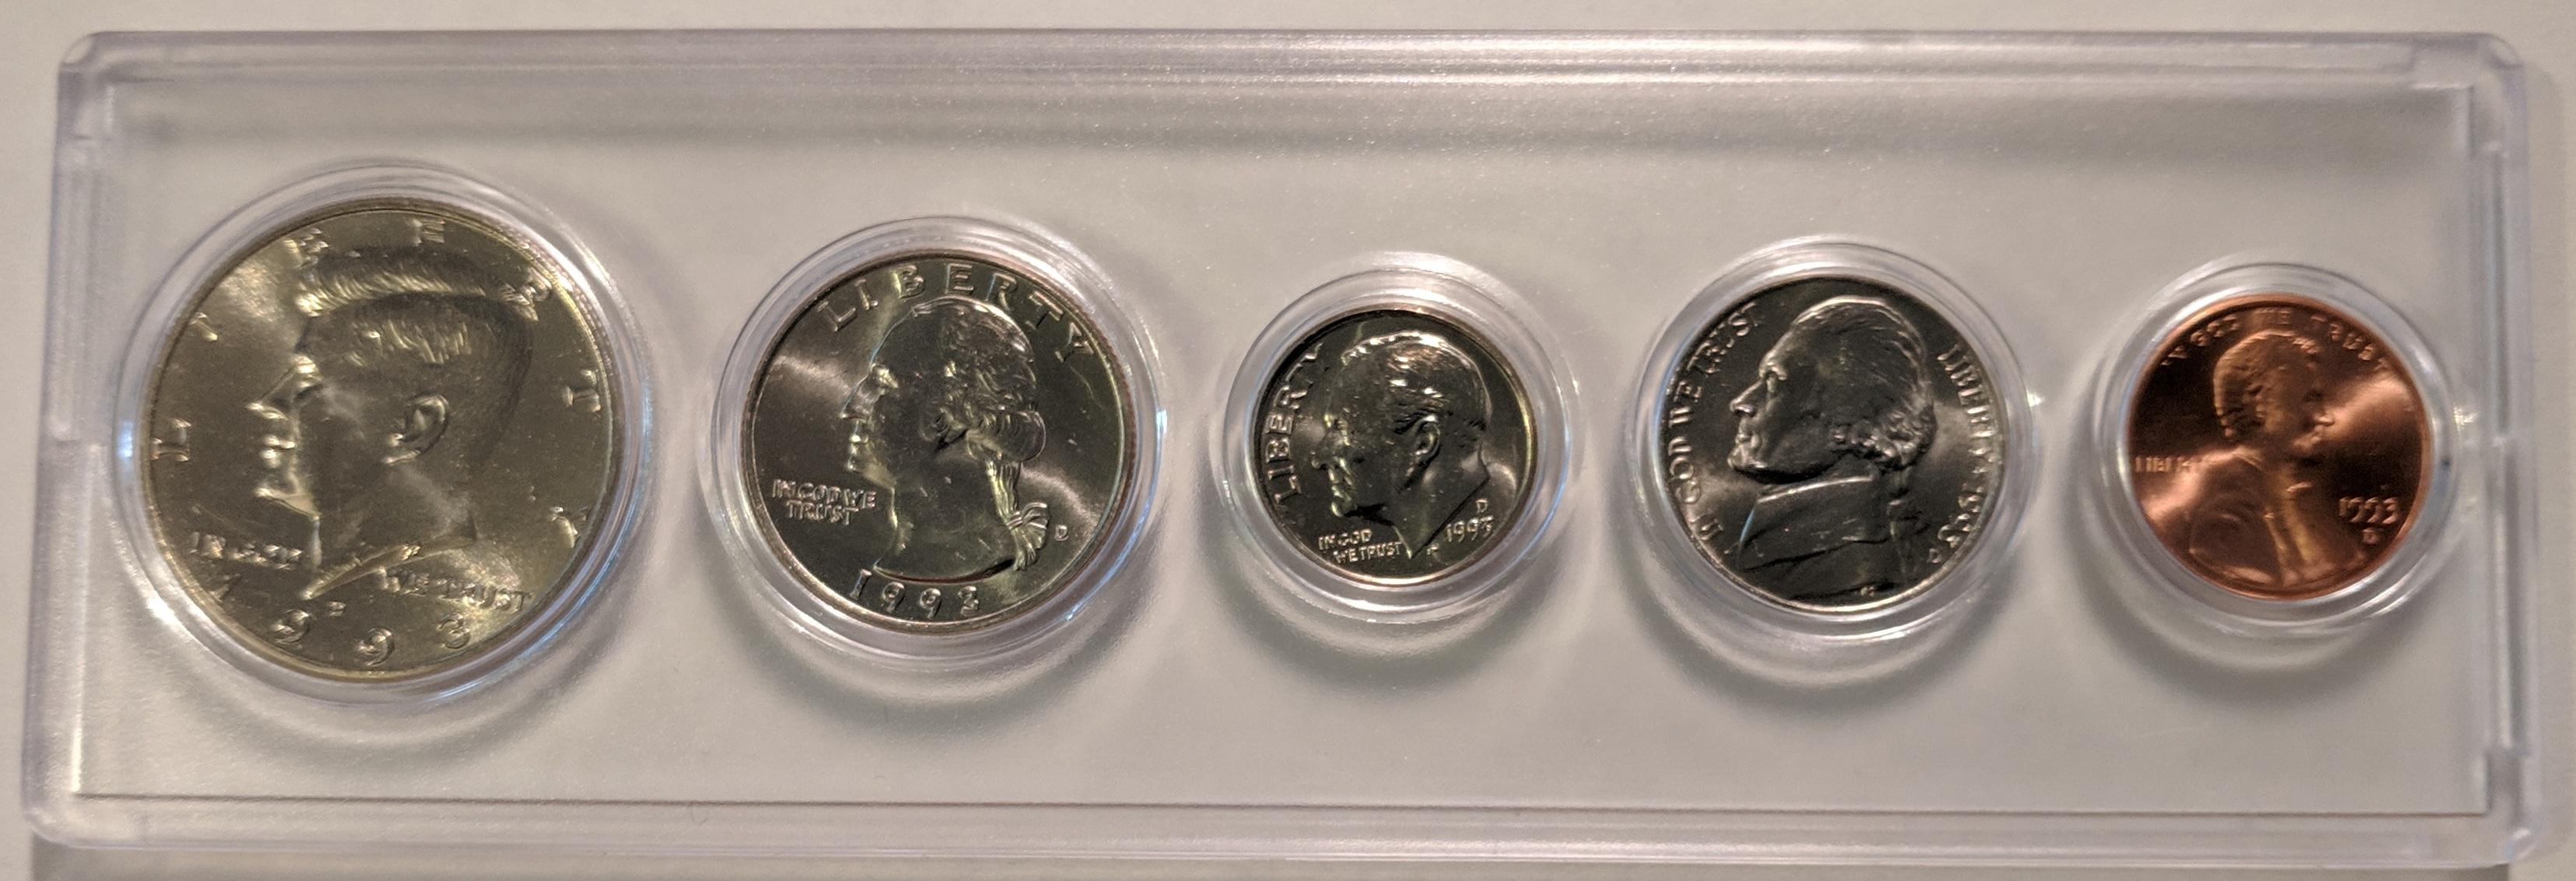 us mint coin sets